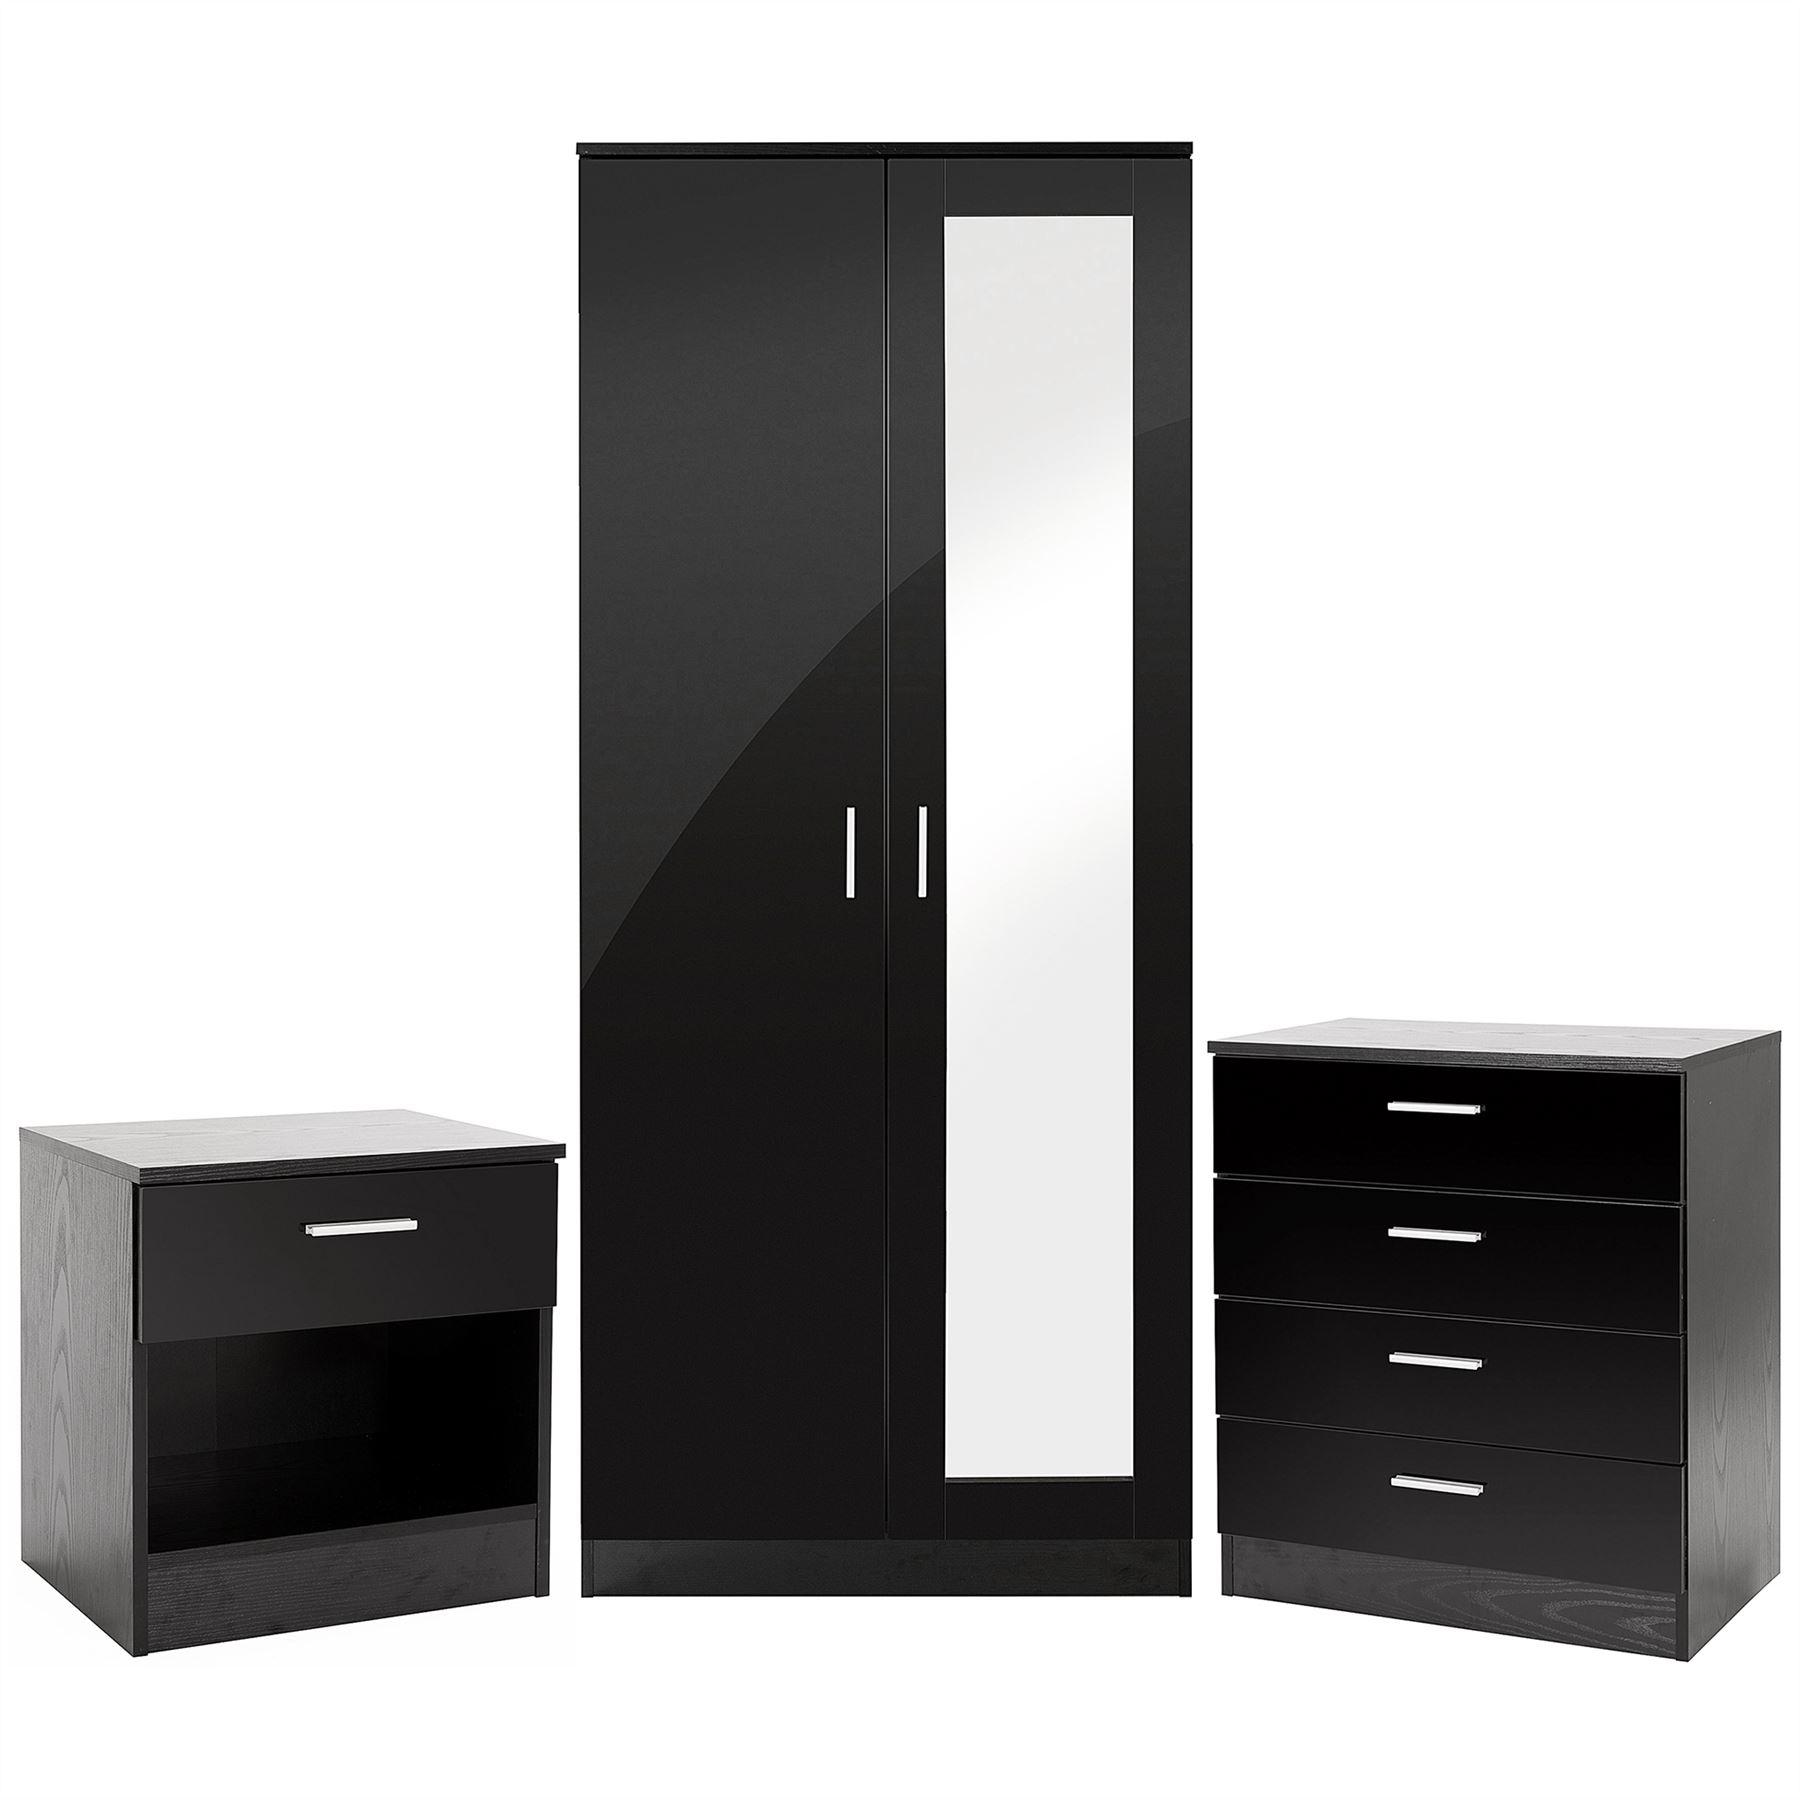 Bedroom furniture 3 piece set black gloss wardrobe drawer for Black gloss bedroom furniture